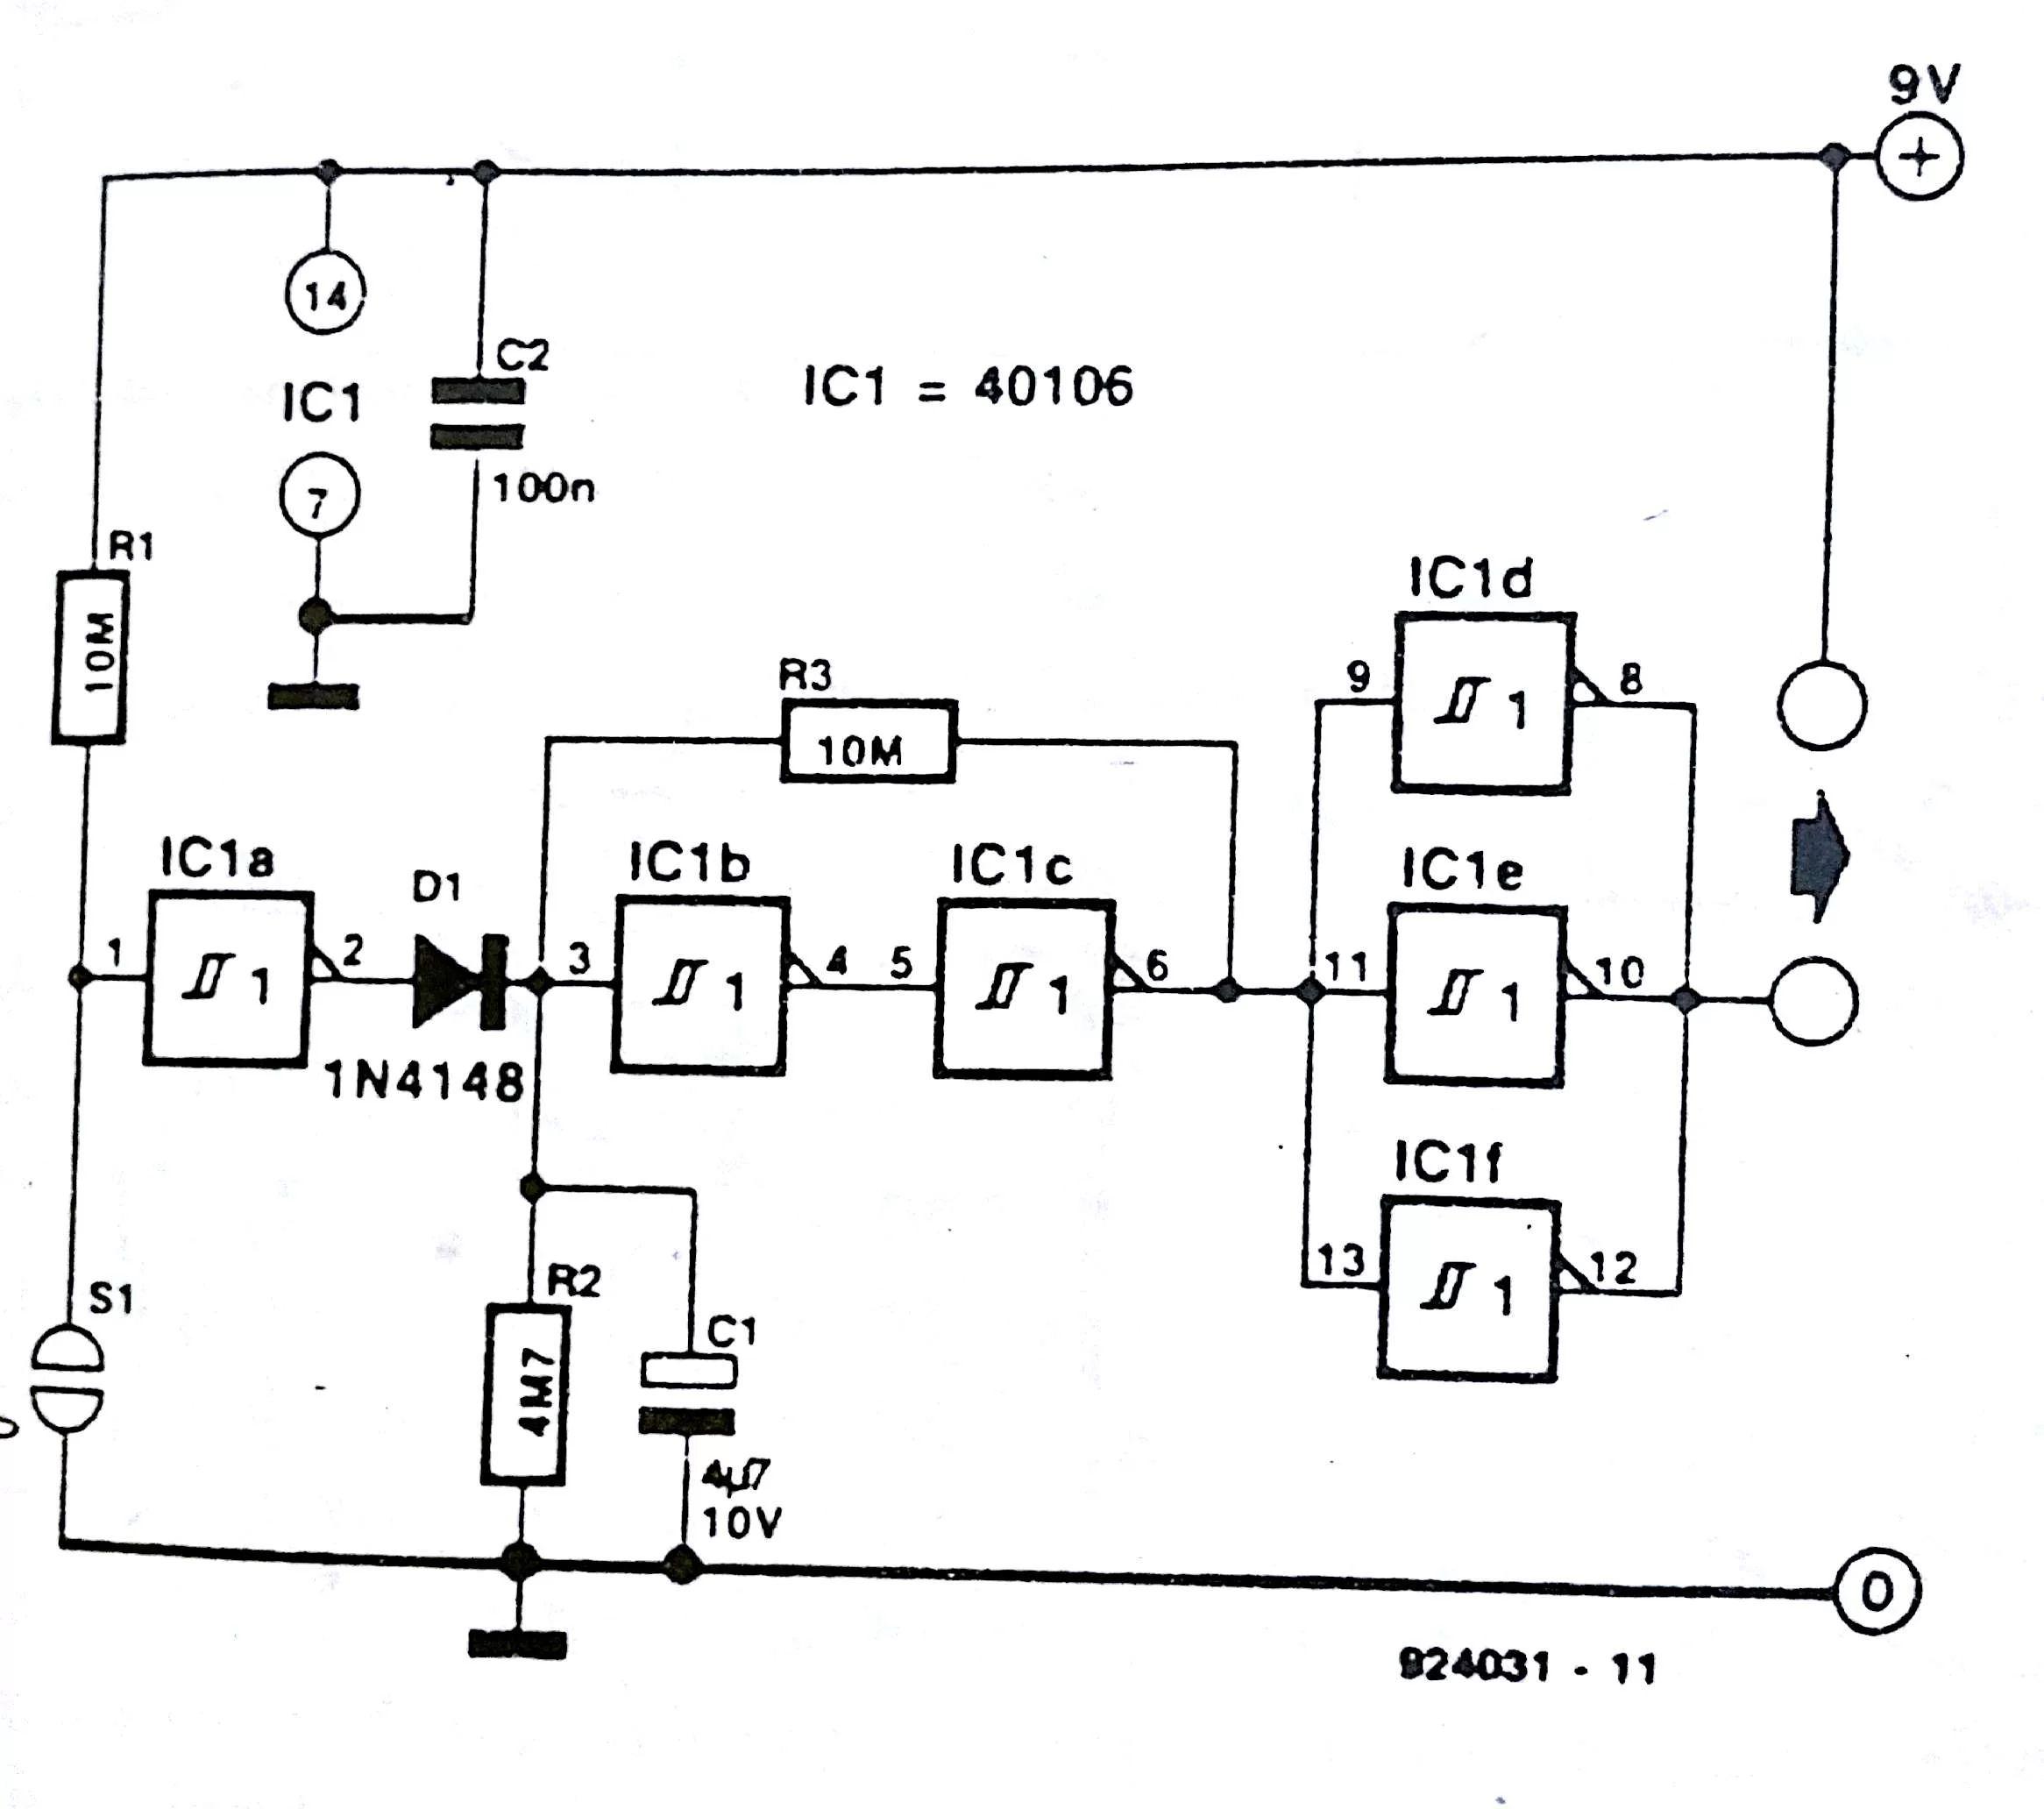 murray 200 amp service panel wiring diagram